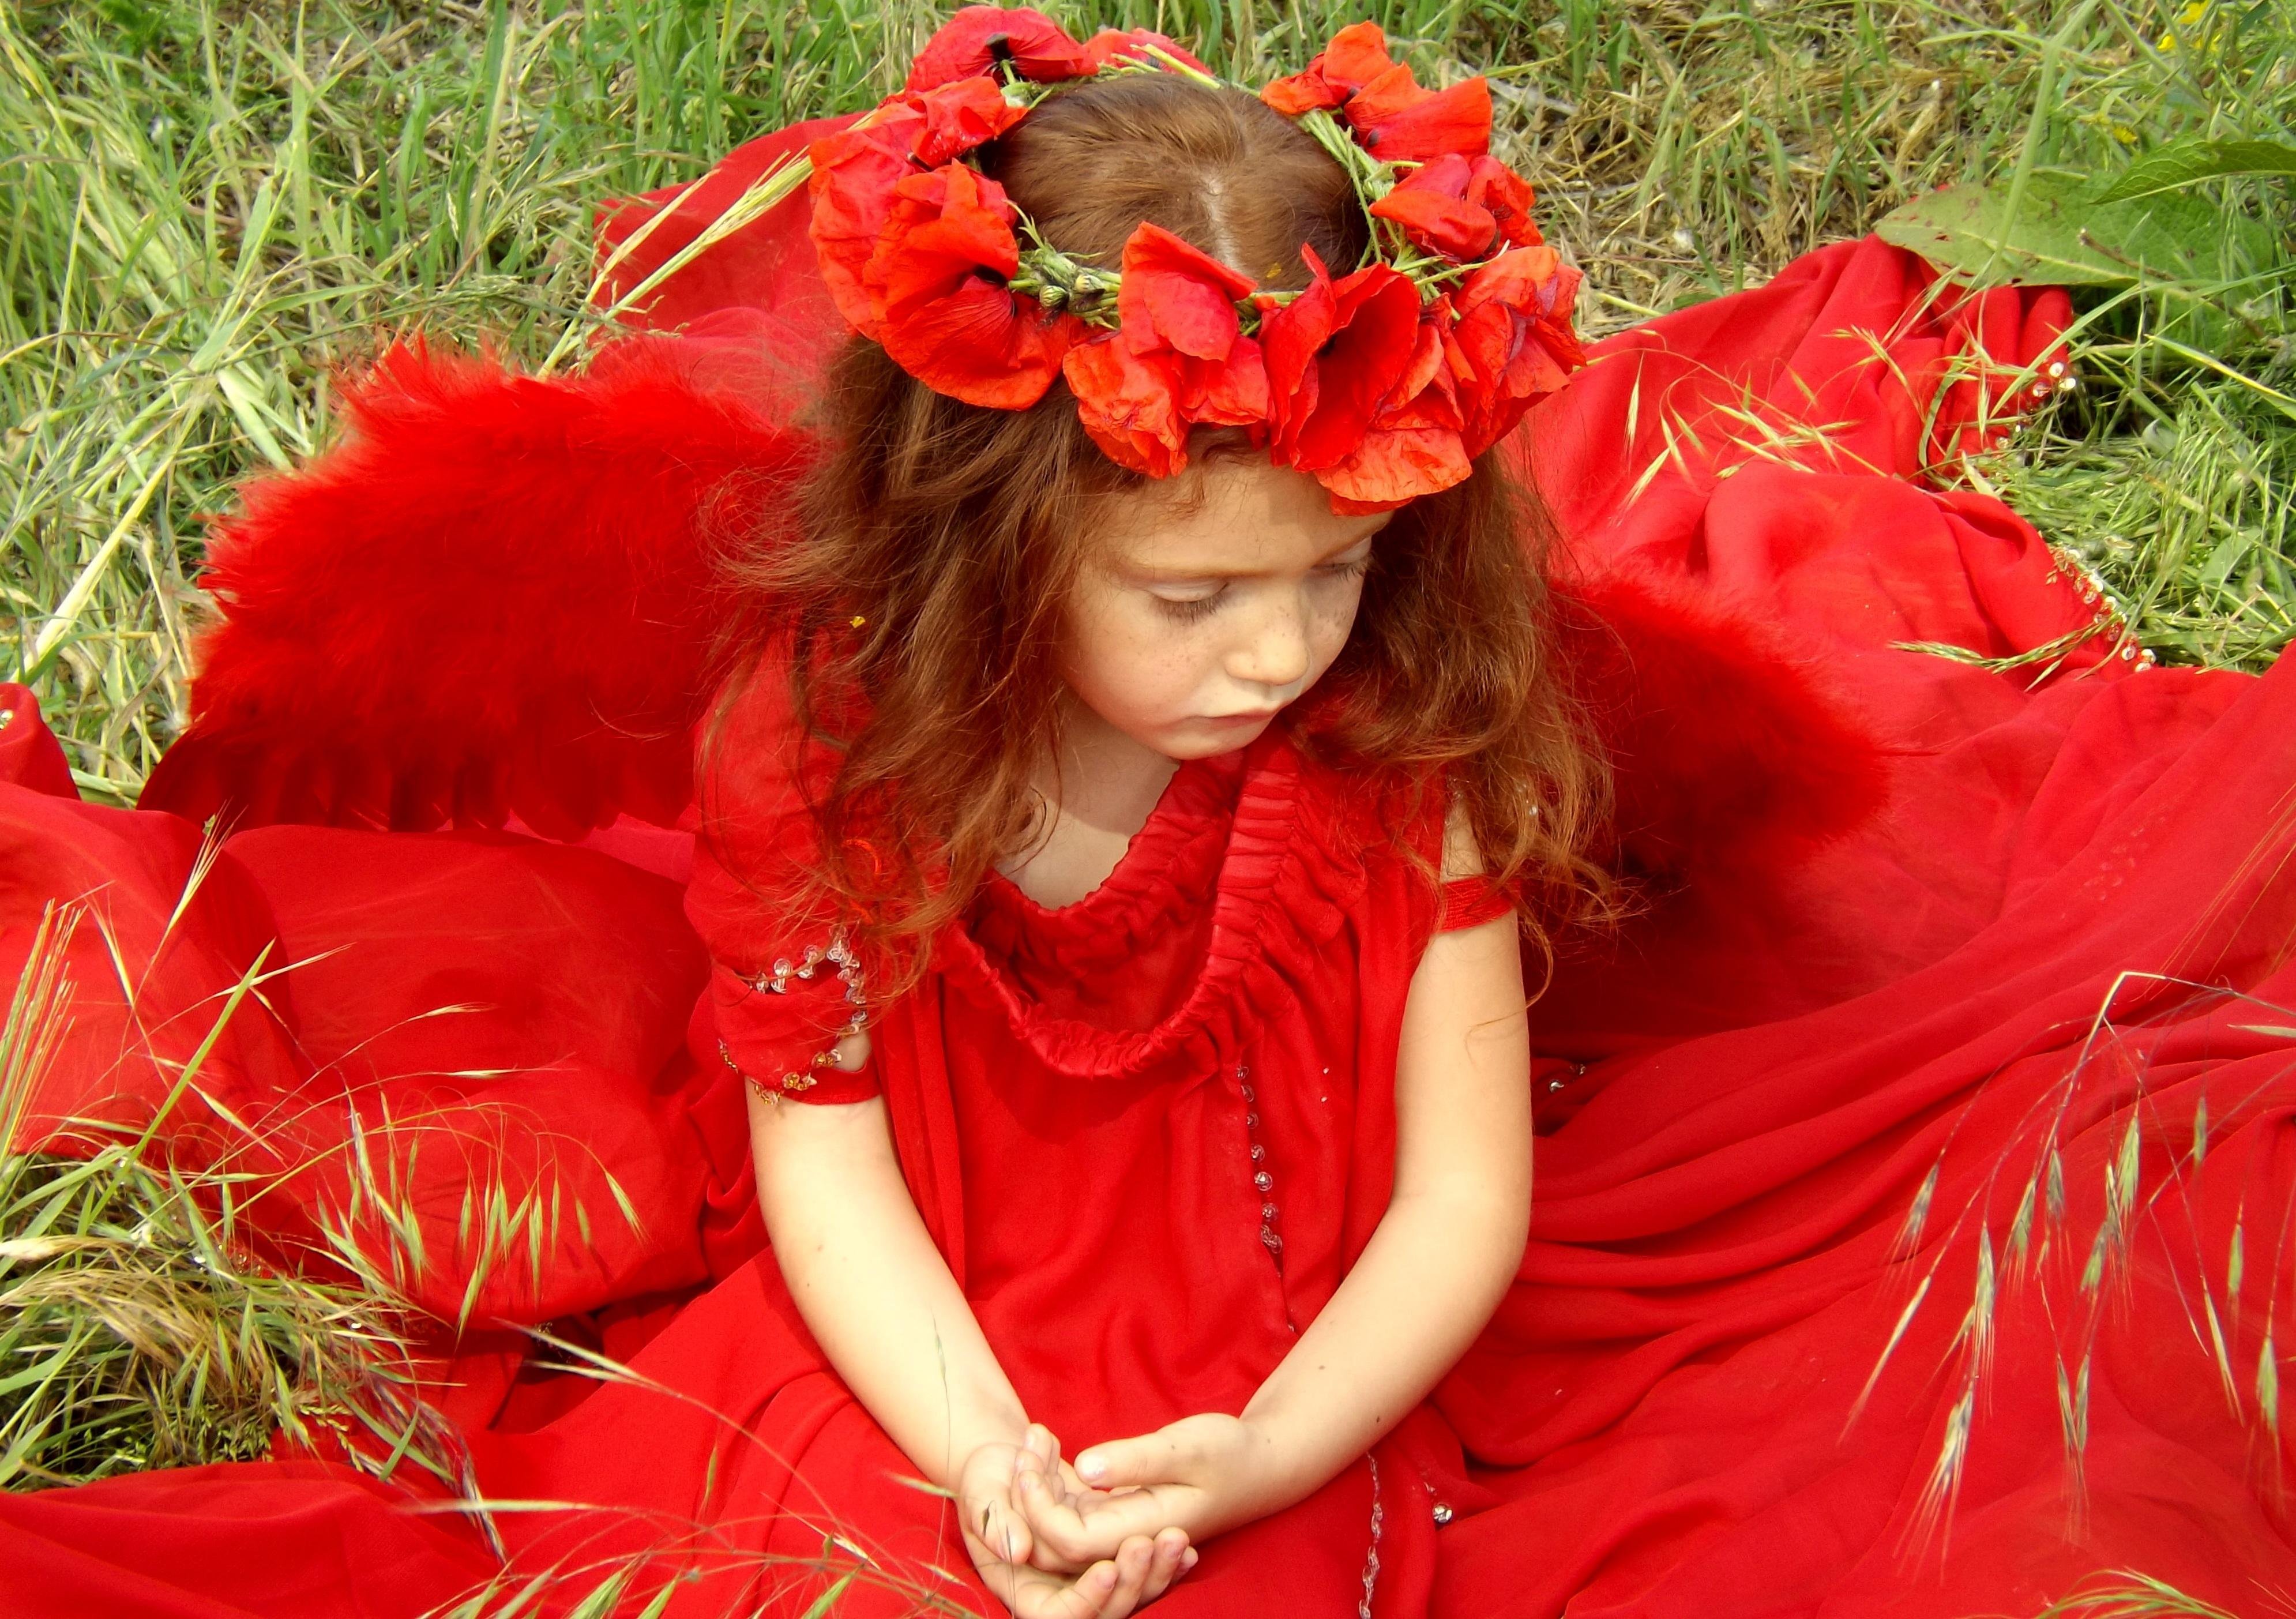 Free Images Plant Girl Flower Petal Autumn Lady